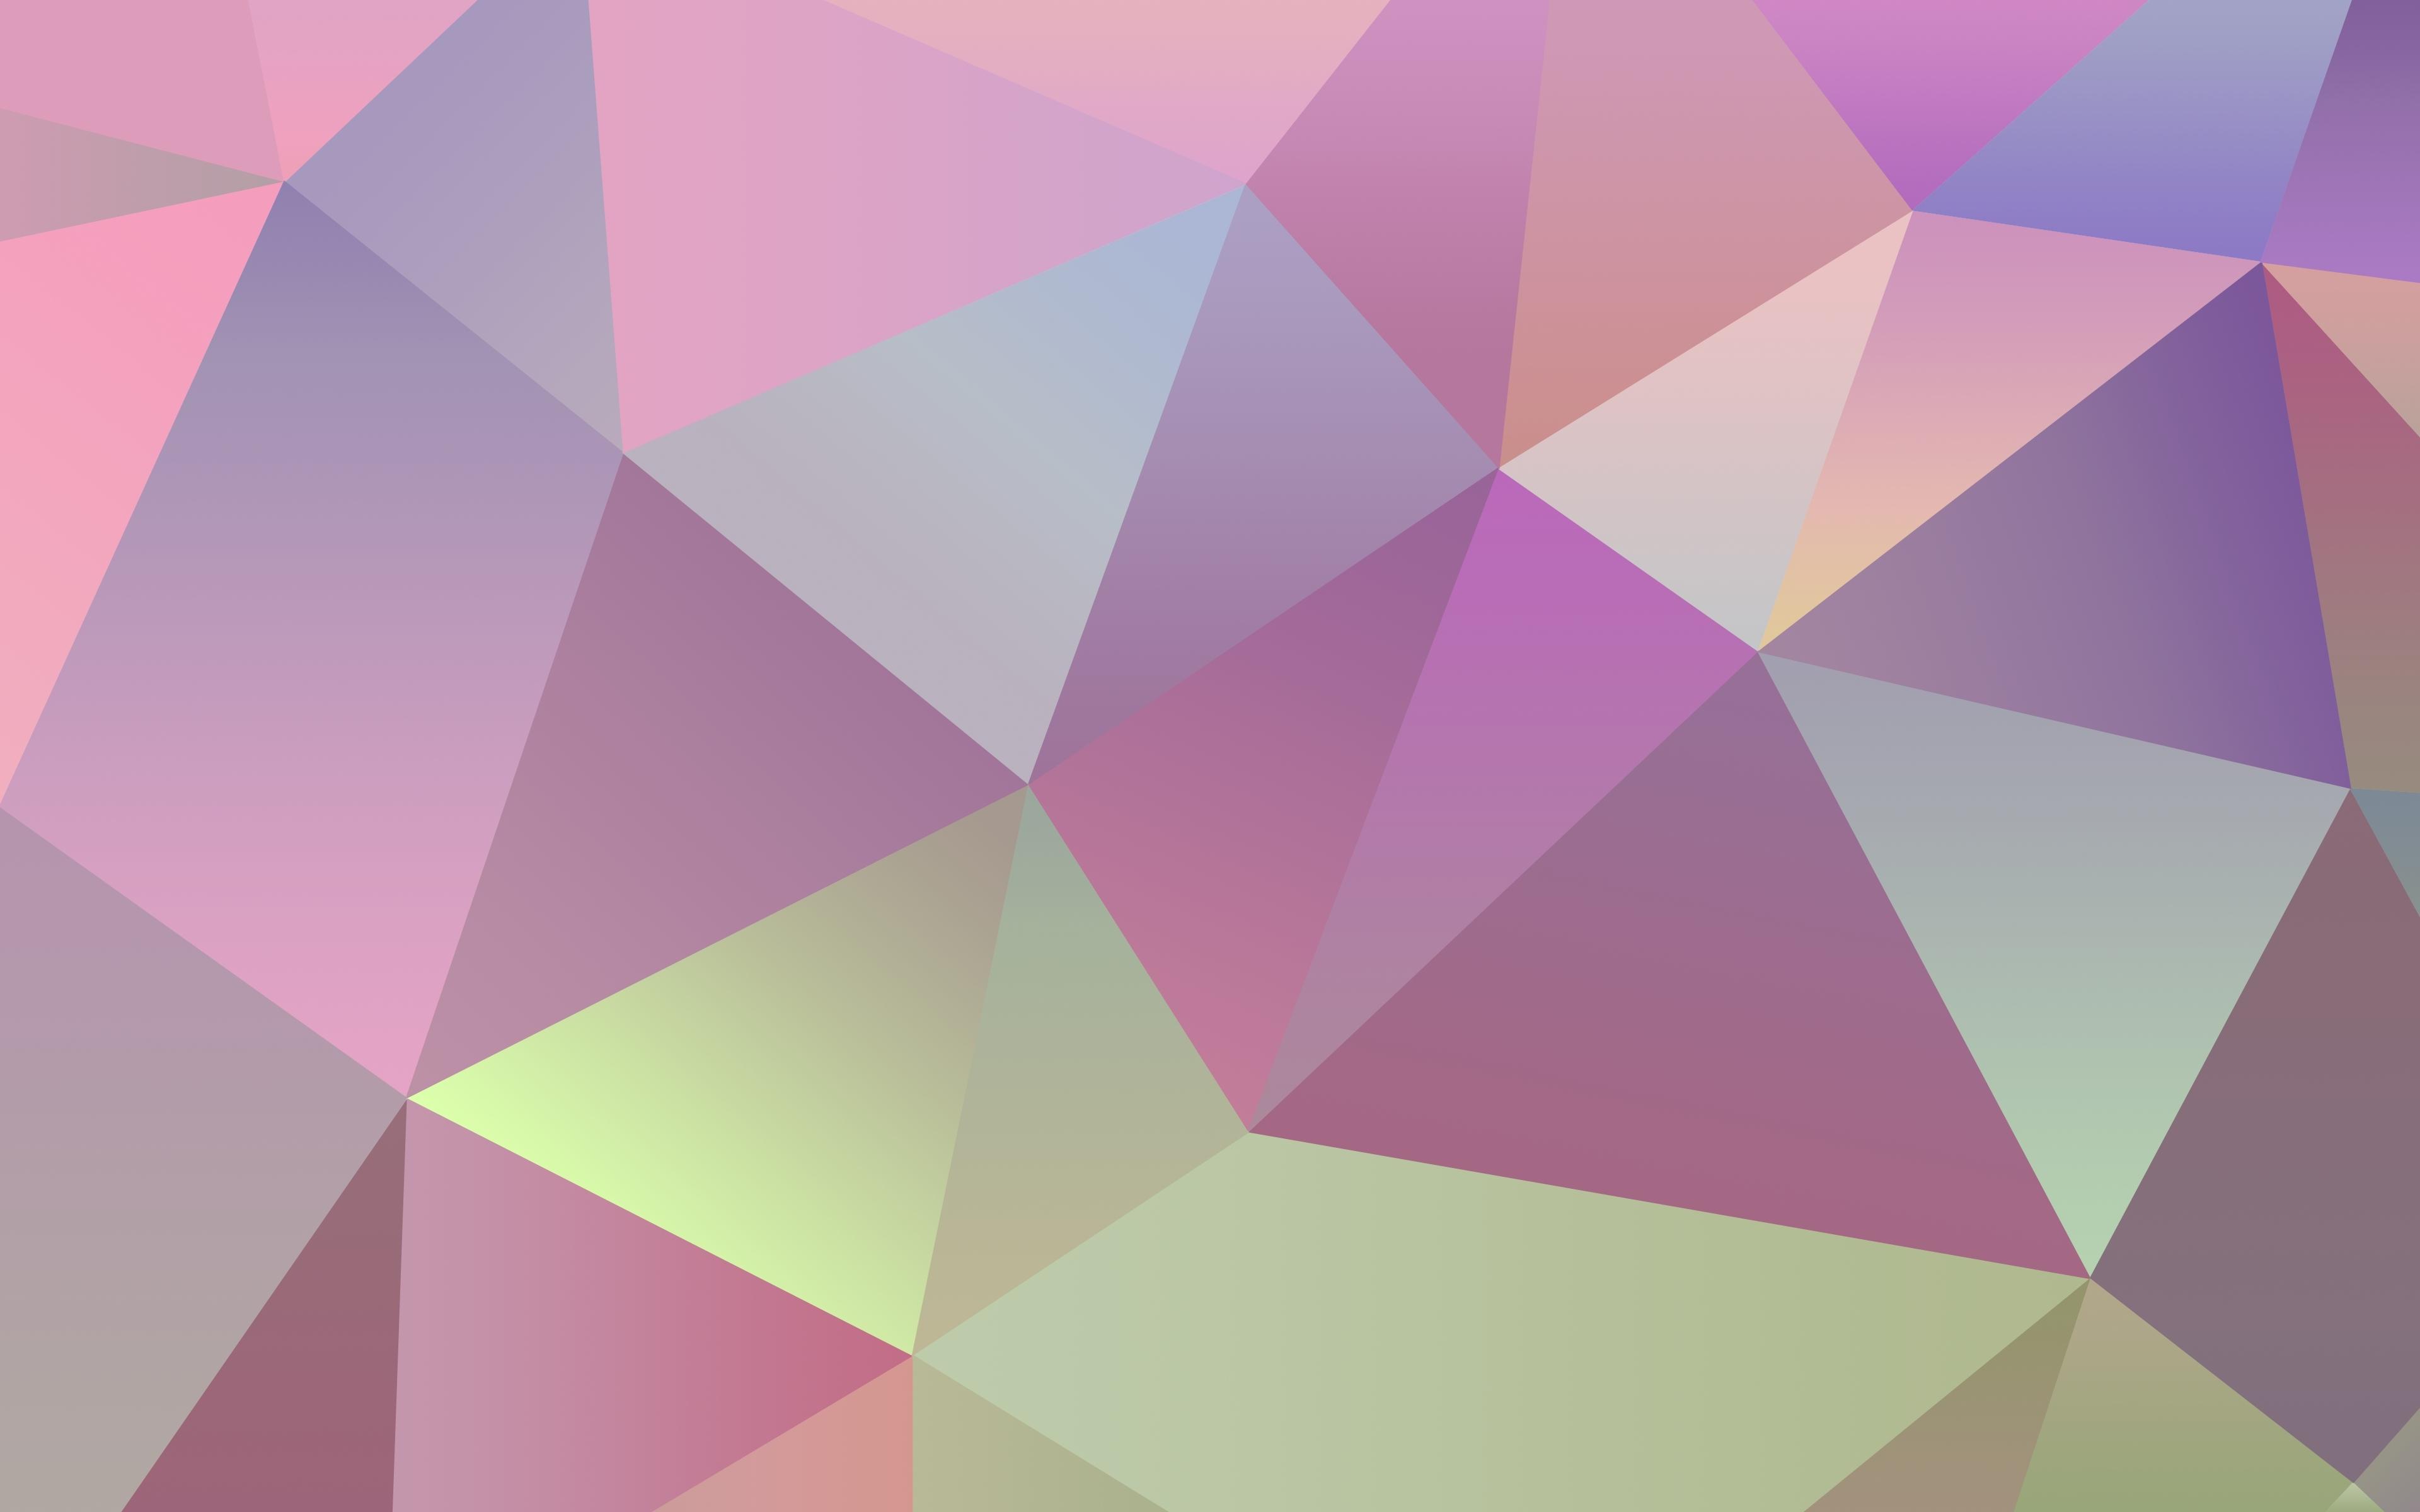 bean simple triangles clean 3840x2400 wallpaper Wallpaper HD download 3840x2400